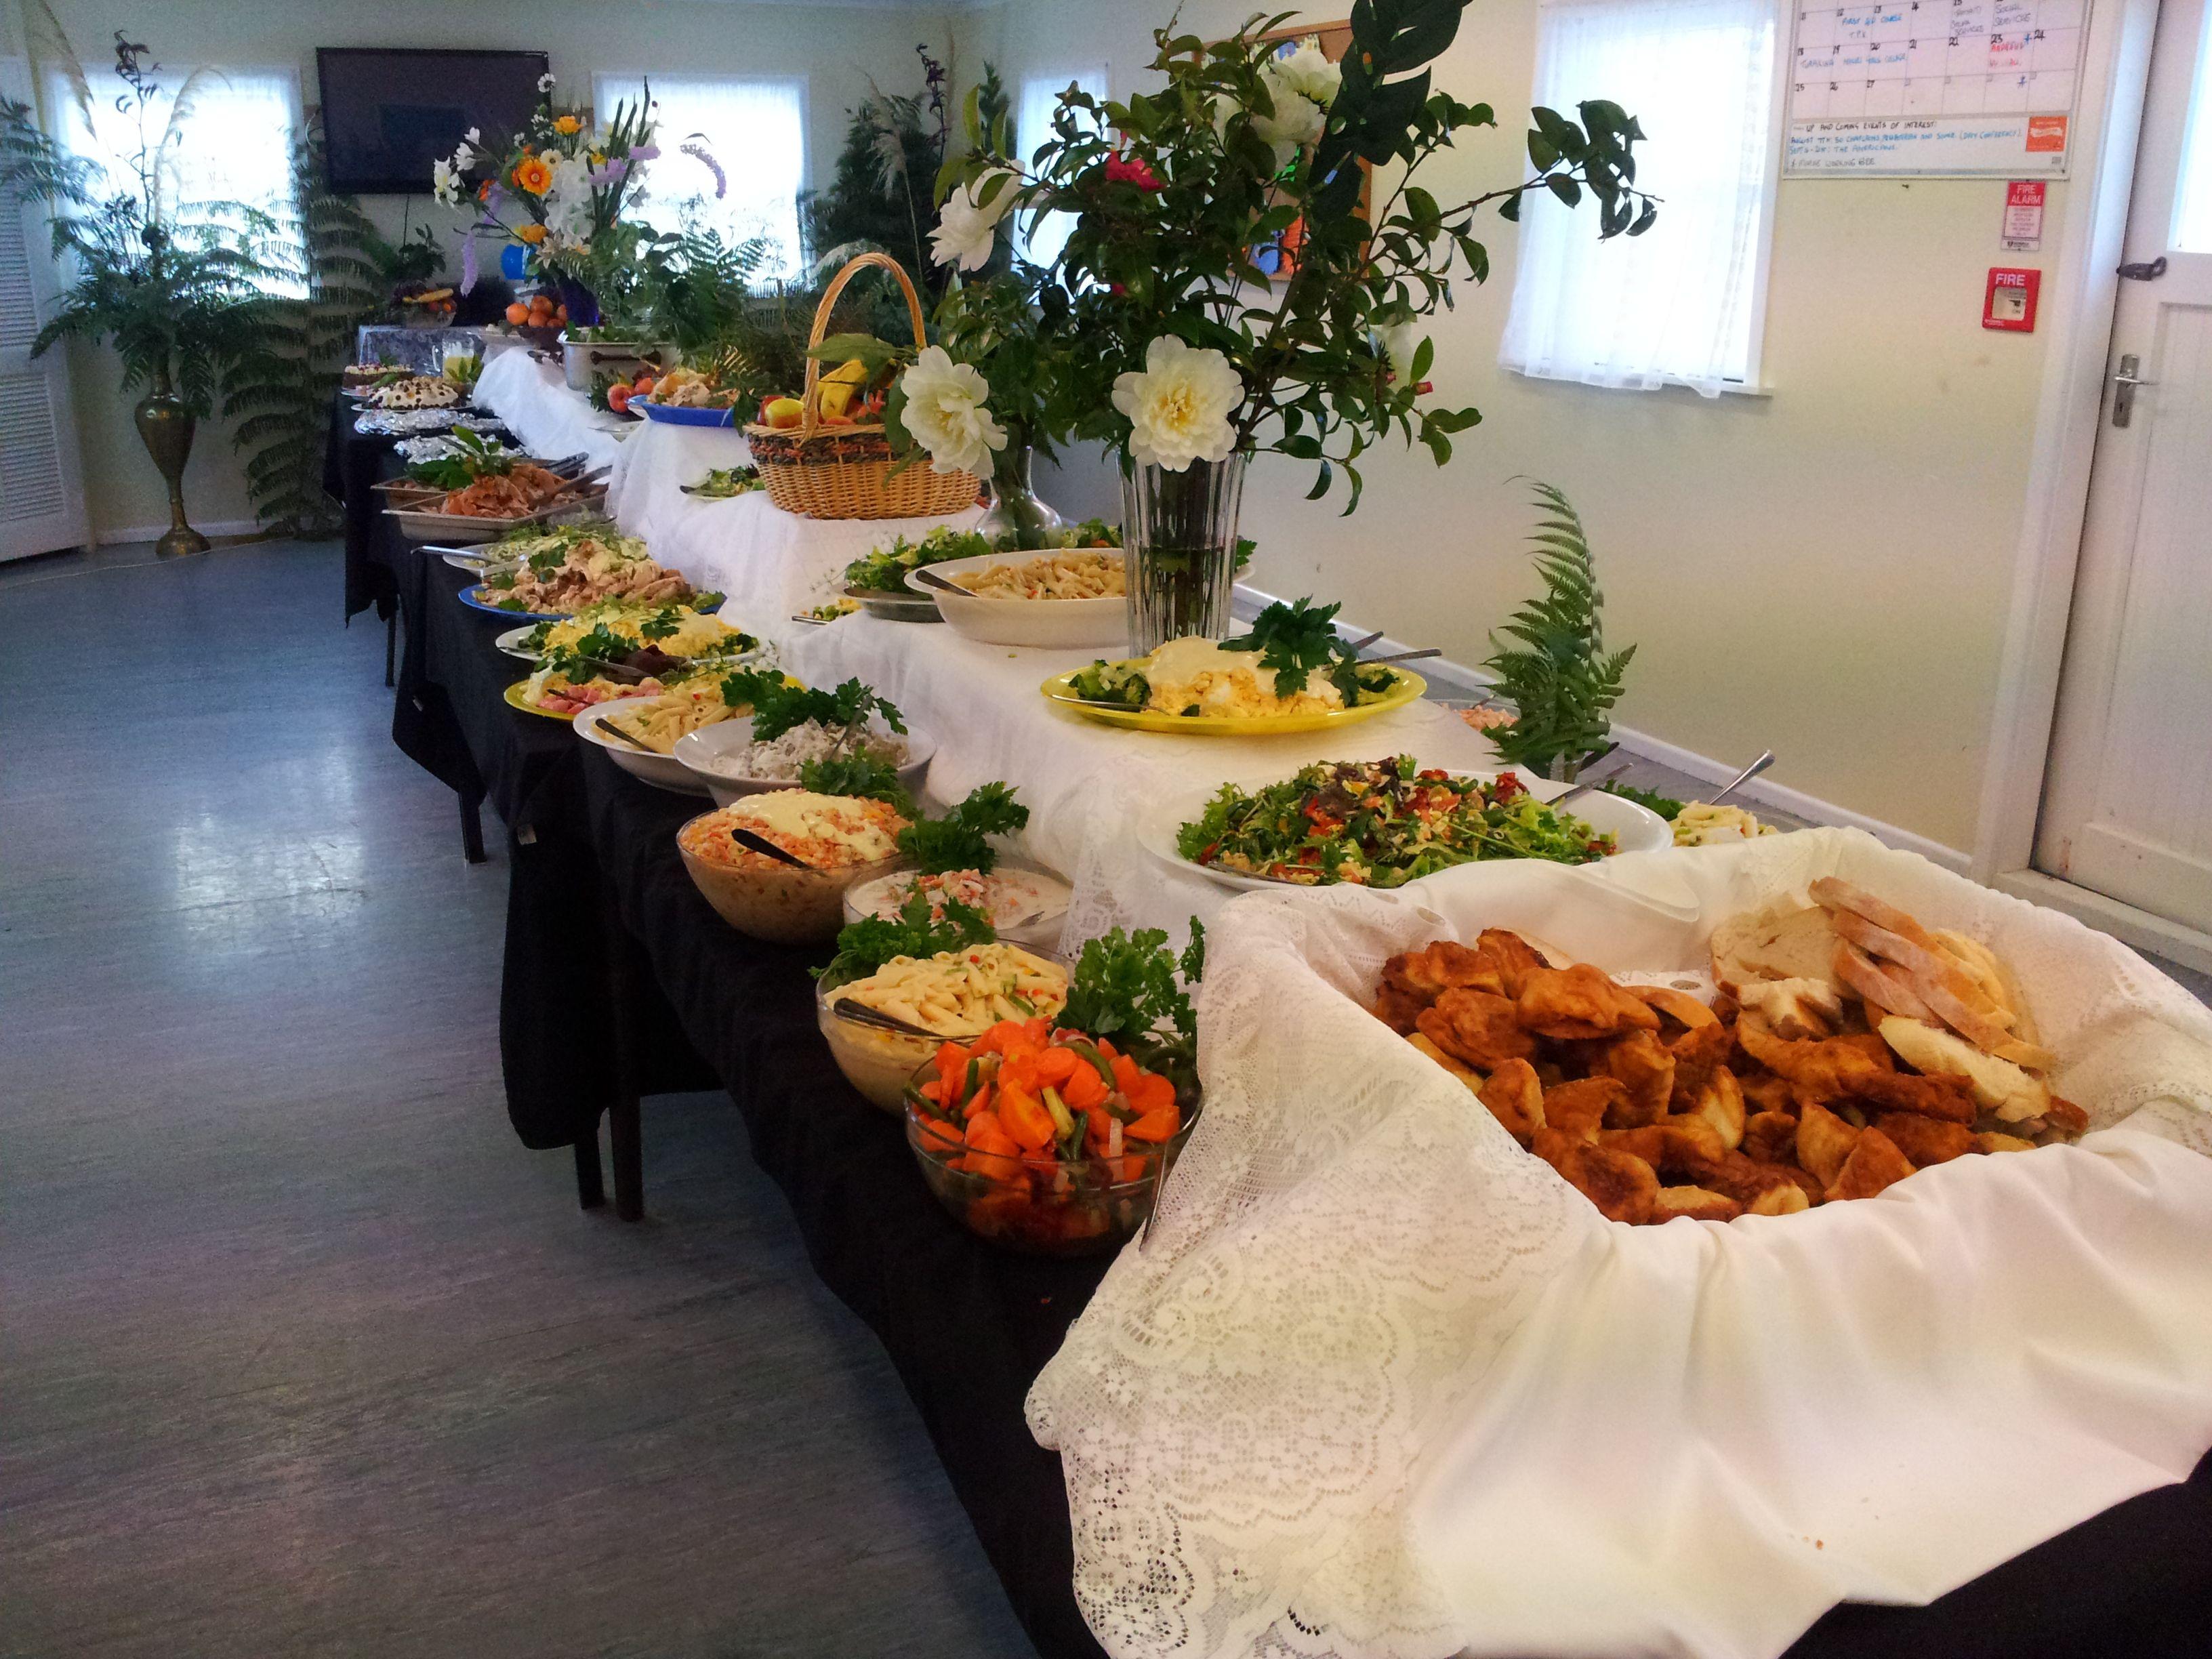 Whanau Hakari at Te Kakano Marae 2012 - 21st Birthday - a simple buffet